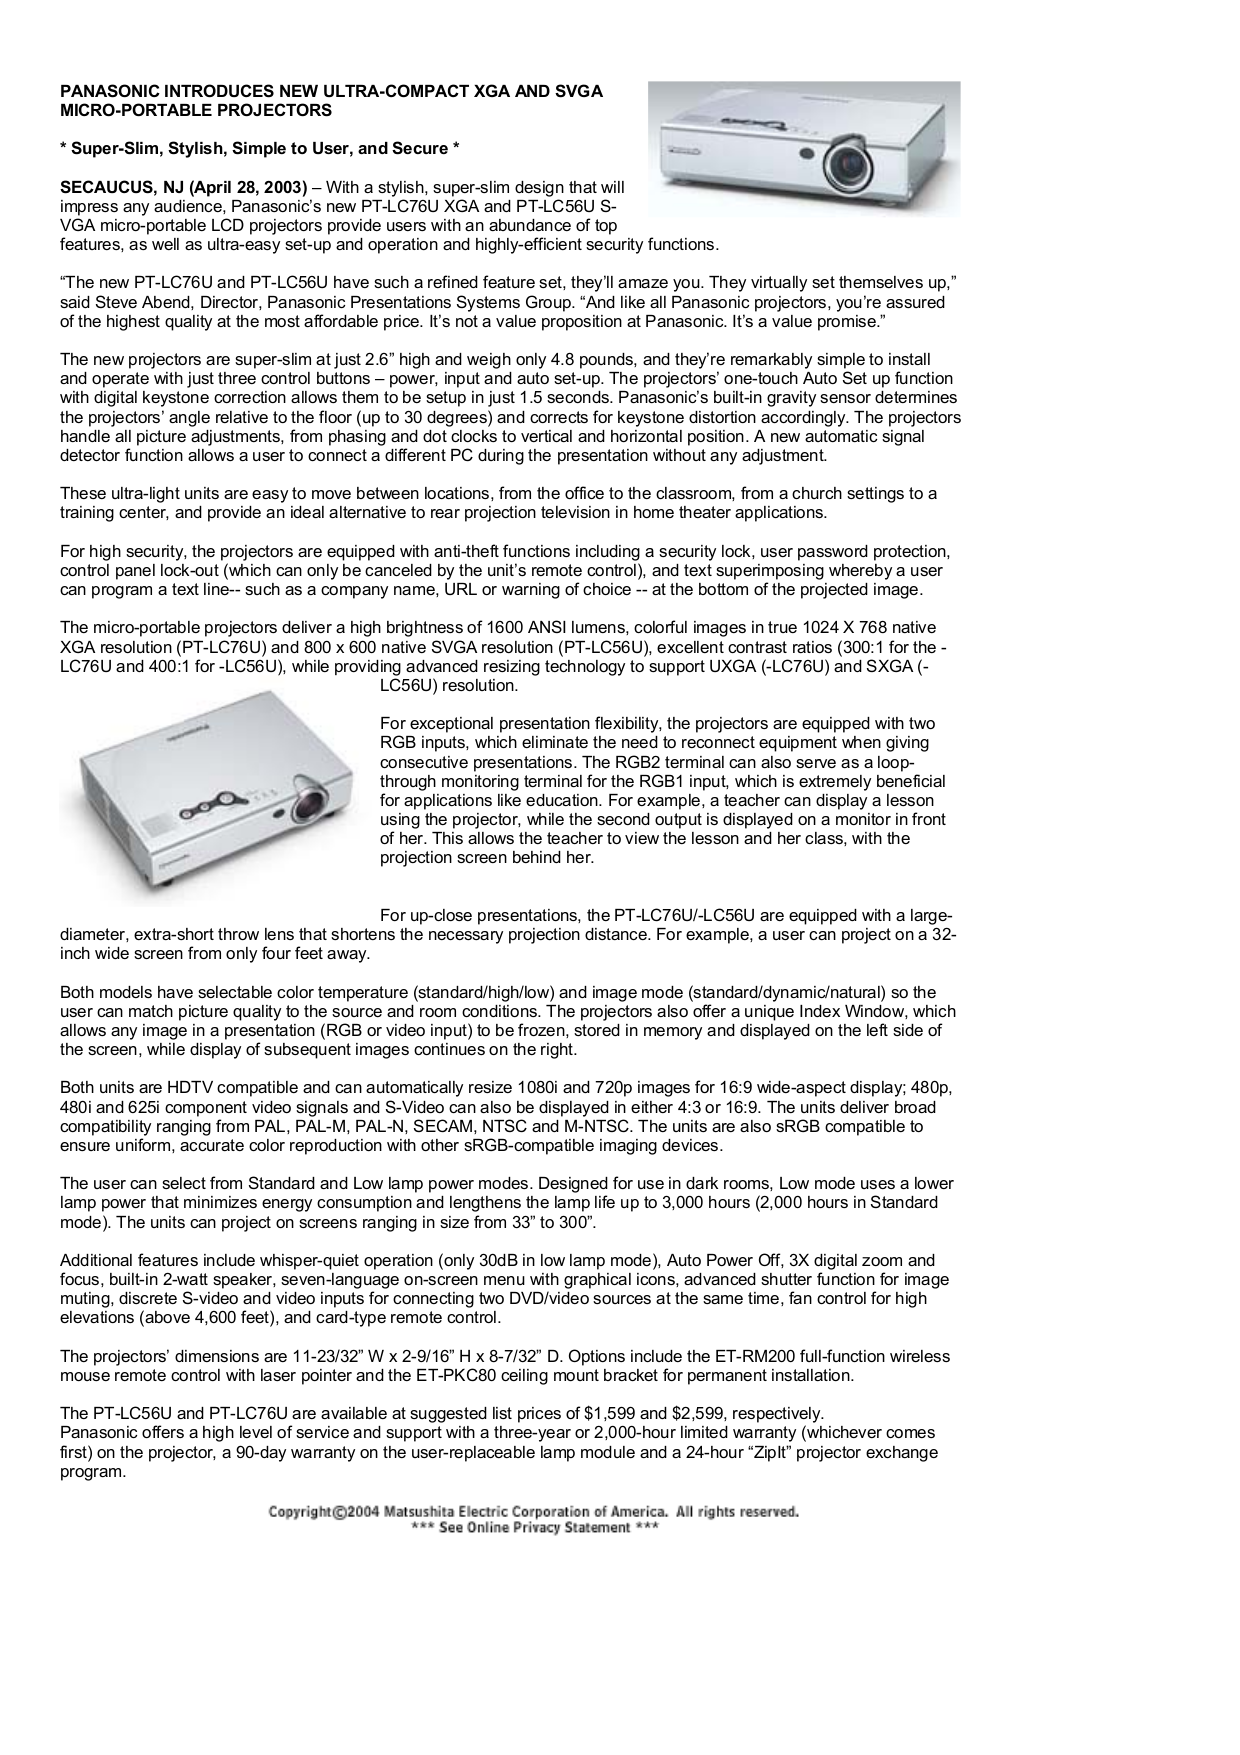 pdf for Panasonic Projector PT-LC56U manual